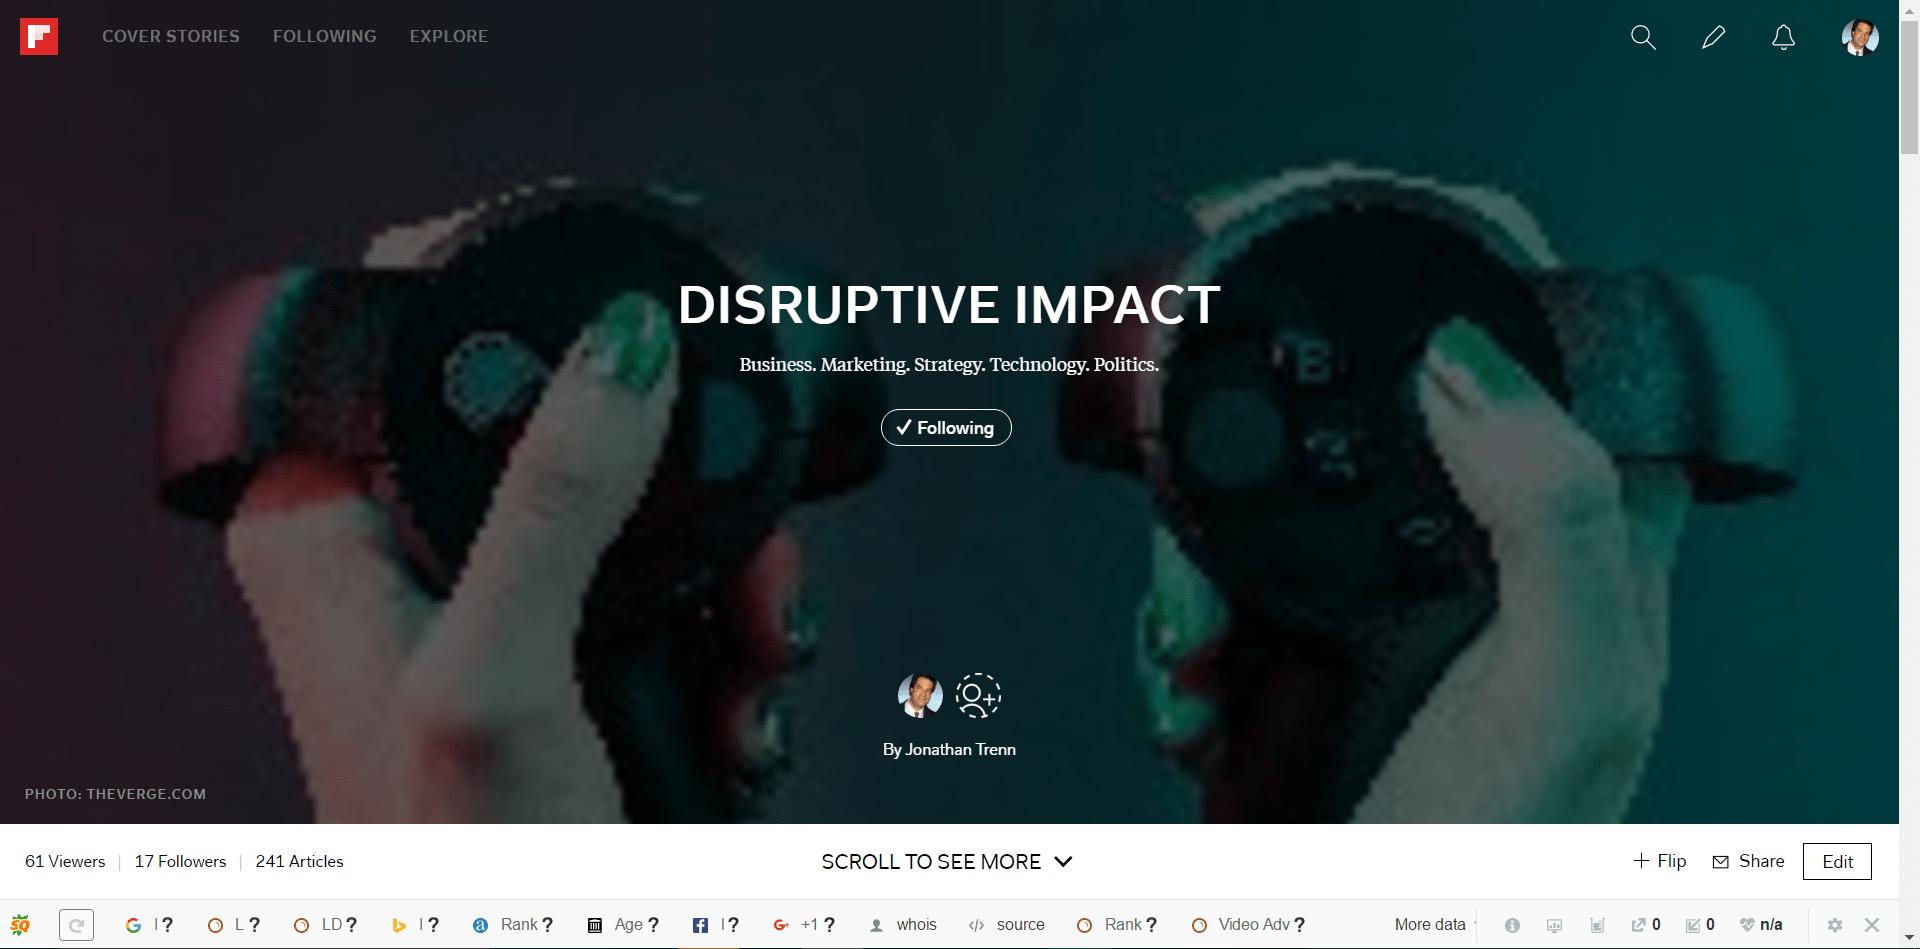 Disruptive Impact screen grab